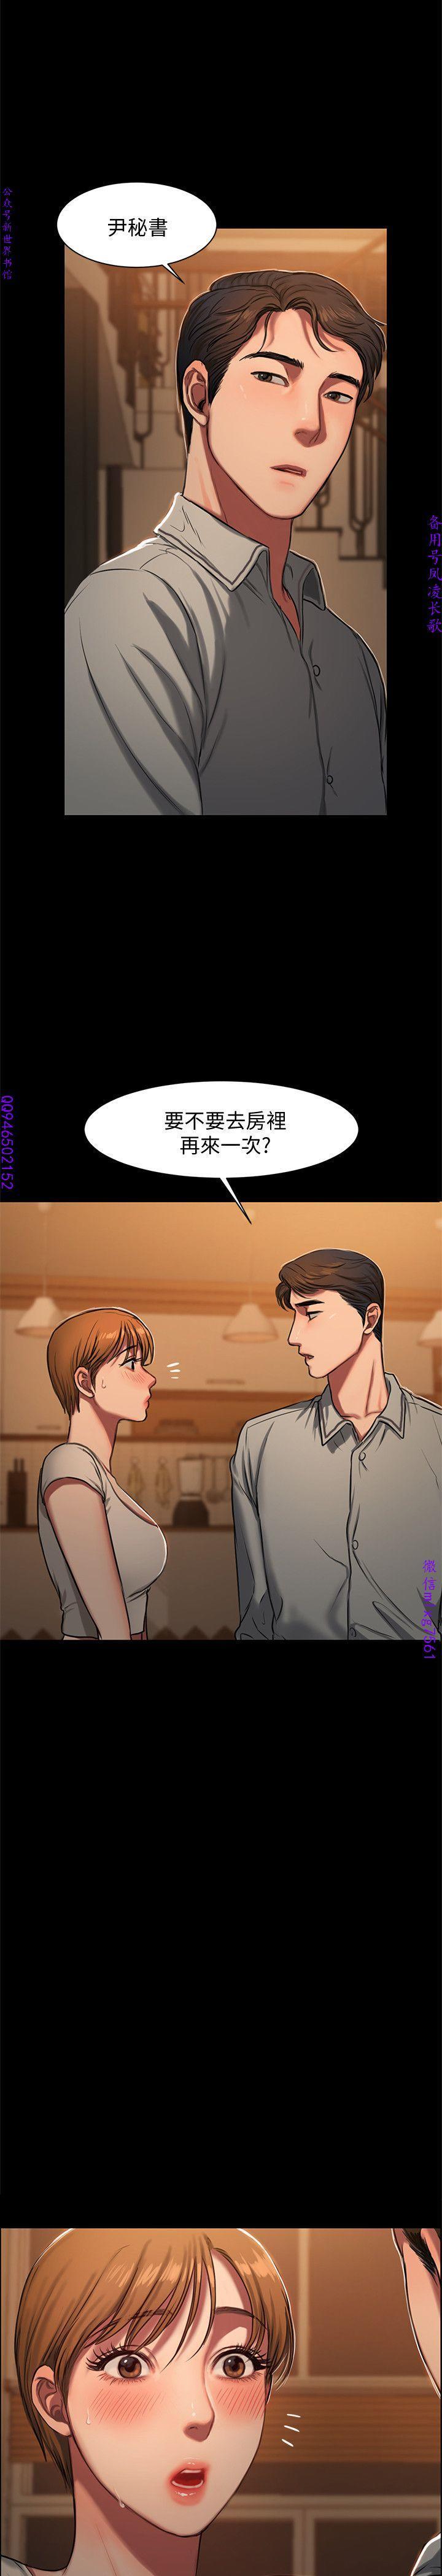 Run away 1-10【中文】 157